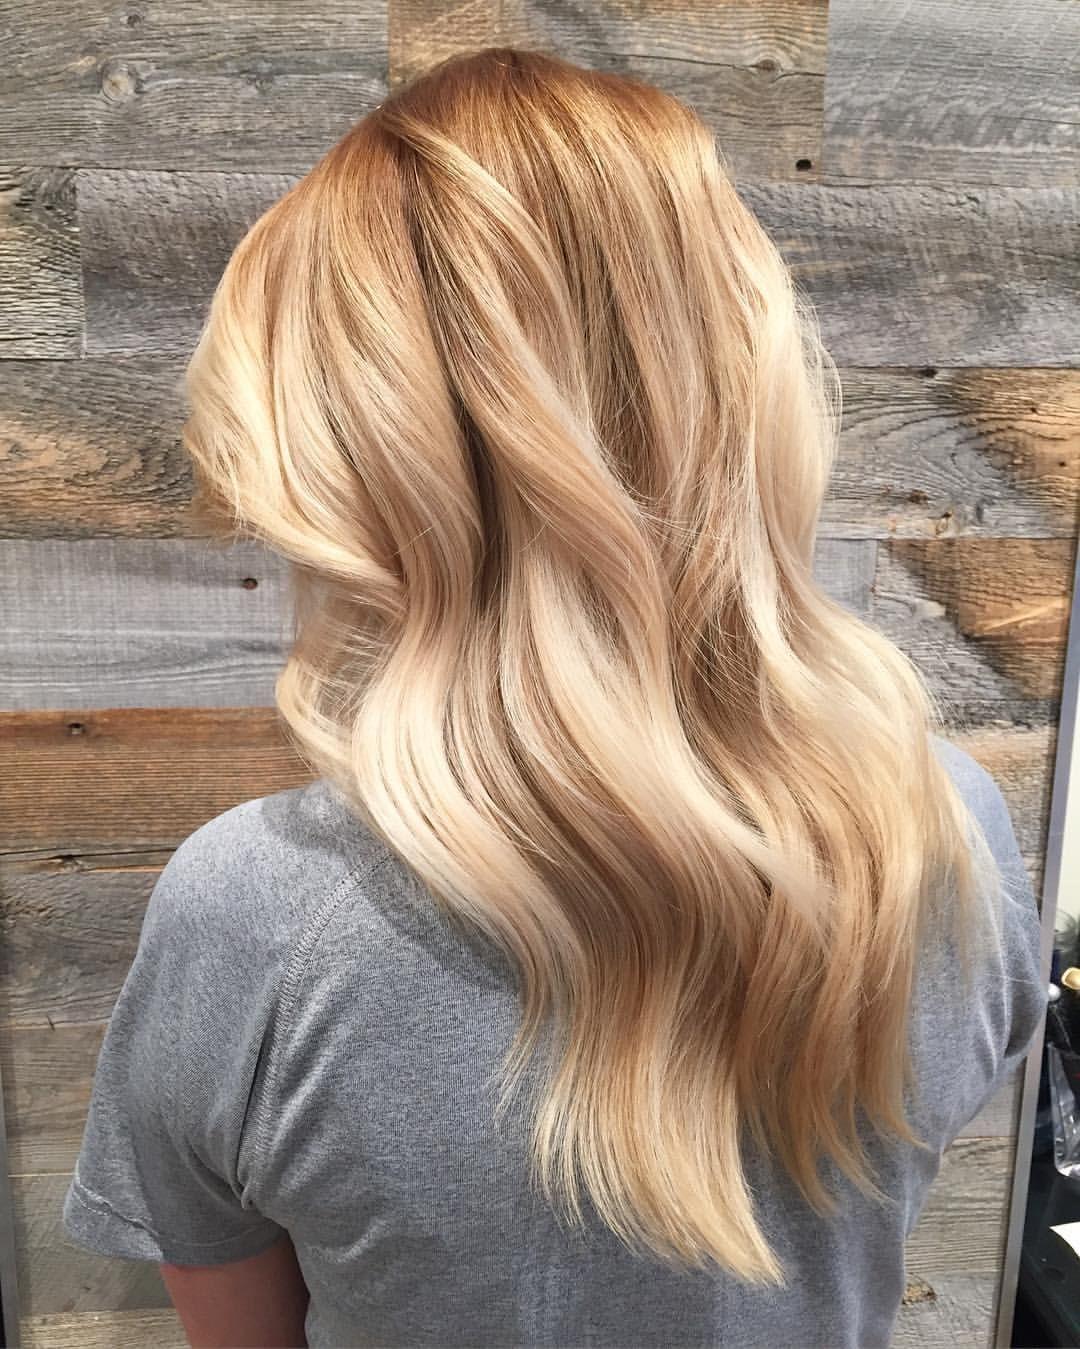 Warm toned blonde \u2026 | Pinteres\u2026